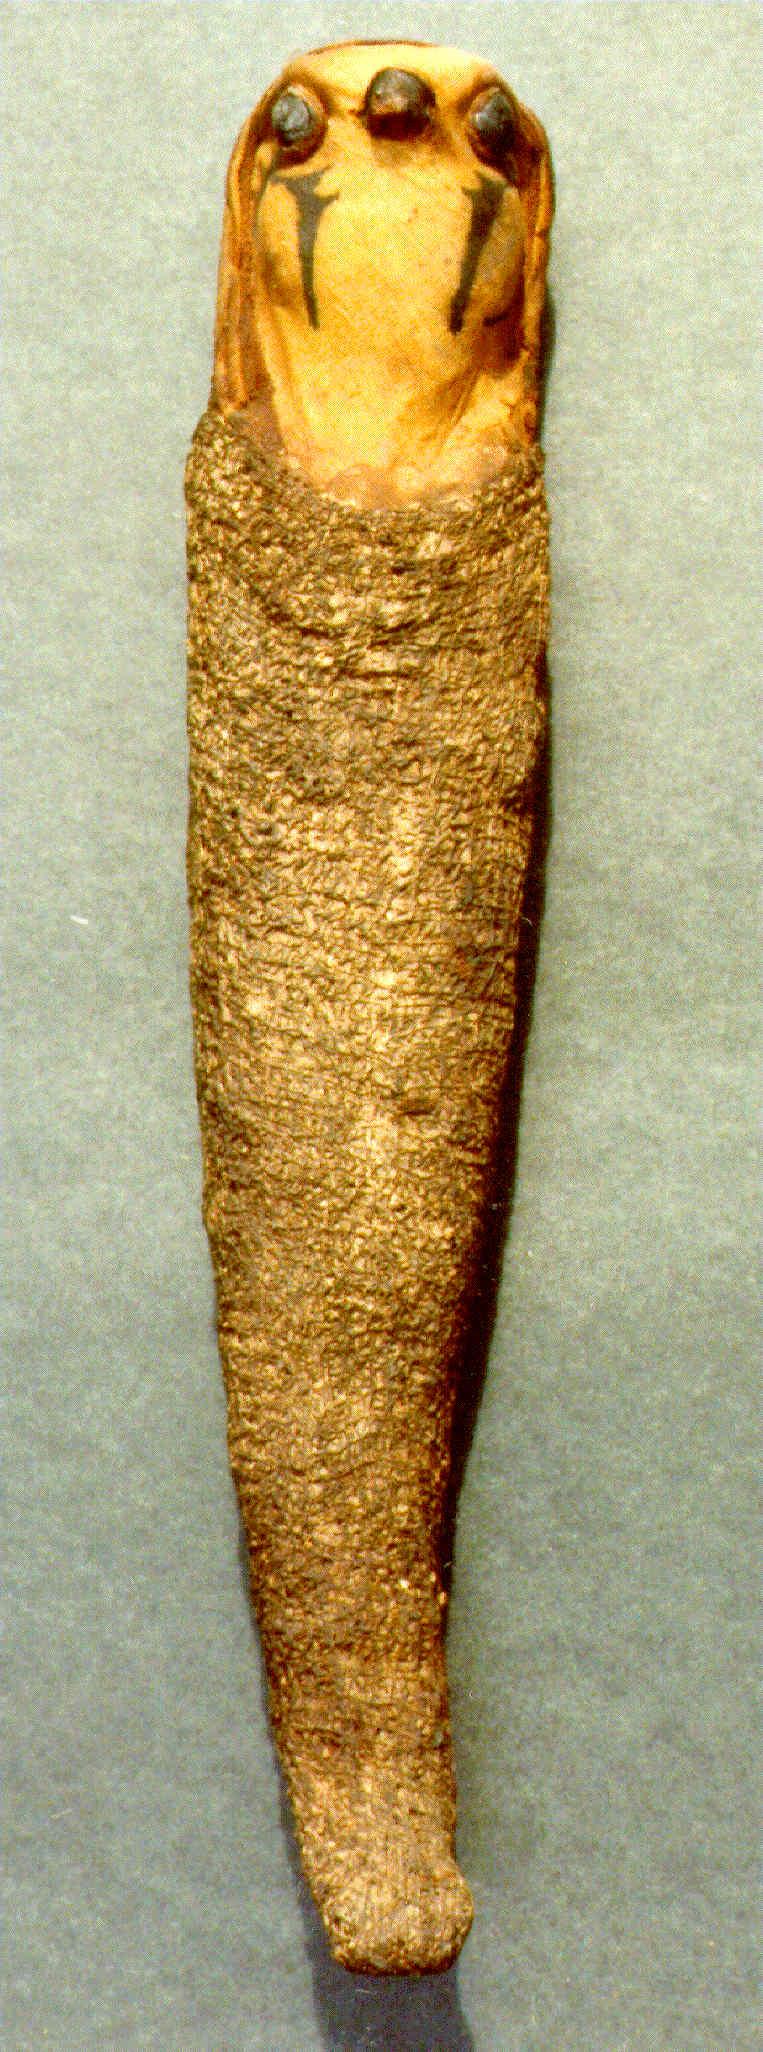 Falcon Mummy